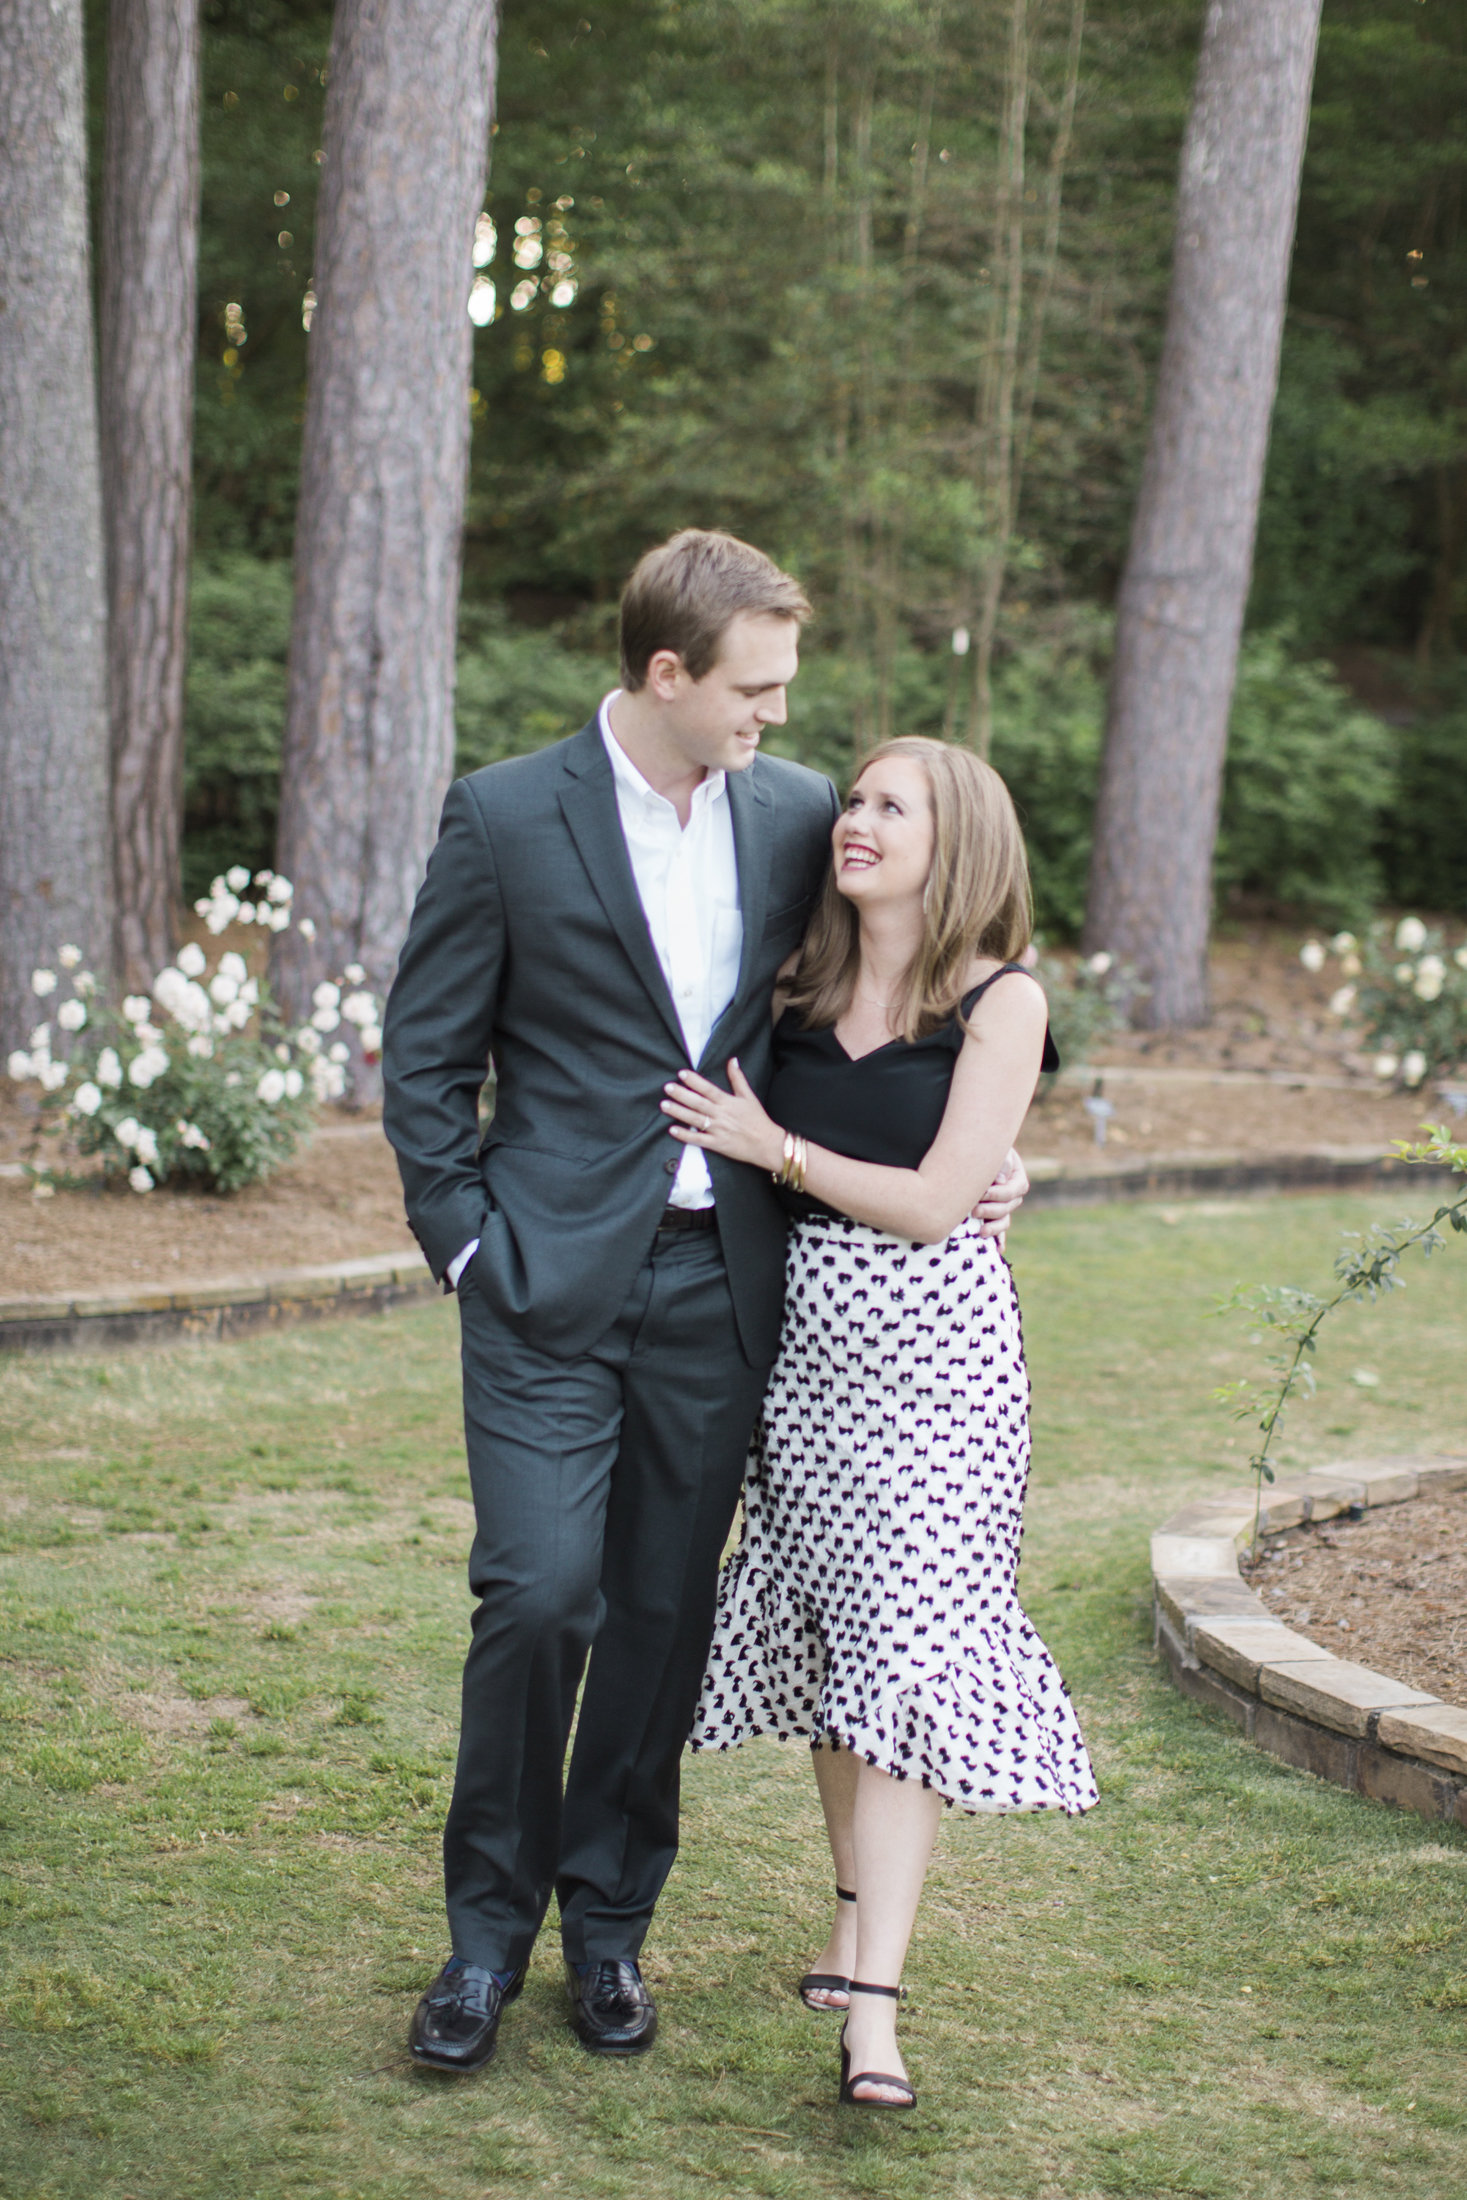 Handley Breaux Designs | Southern Wedding | Birmingham Wedding | Engagement Photos | Southern Bride